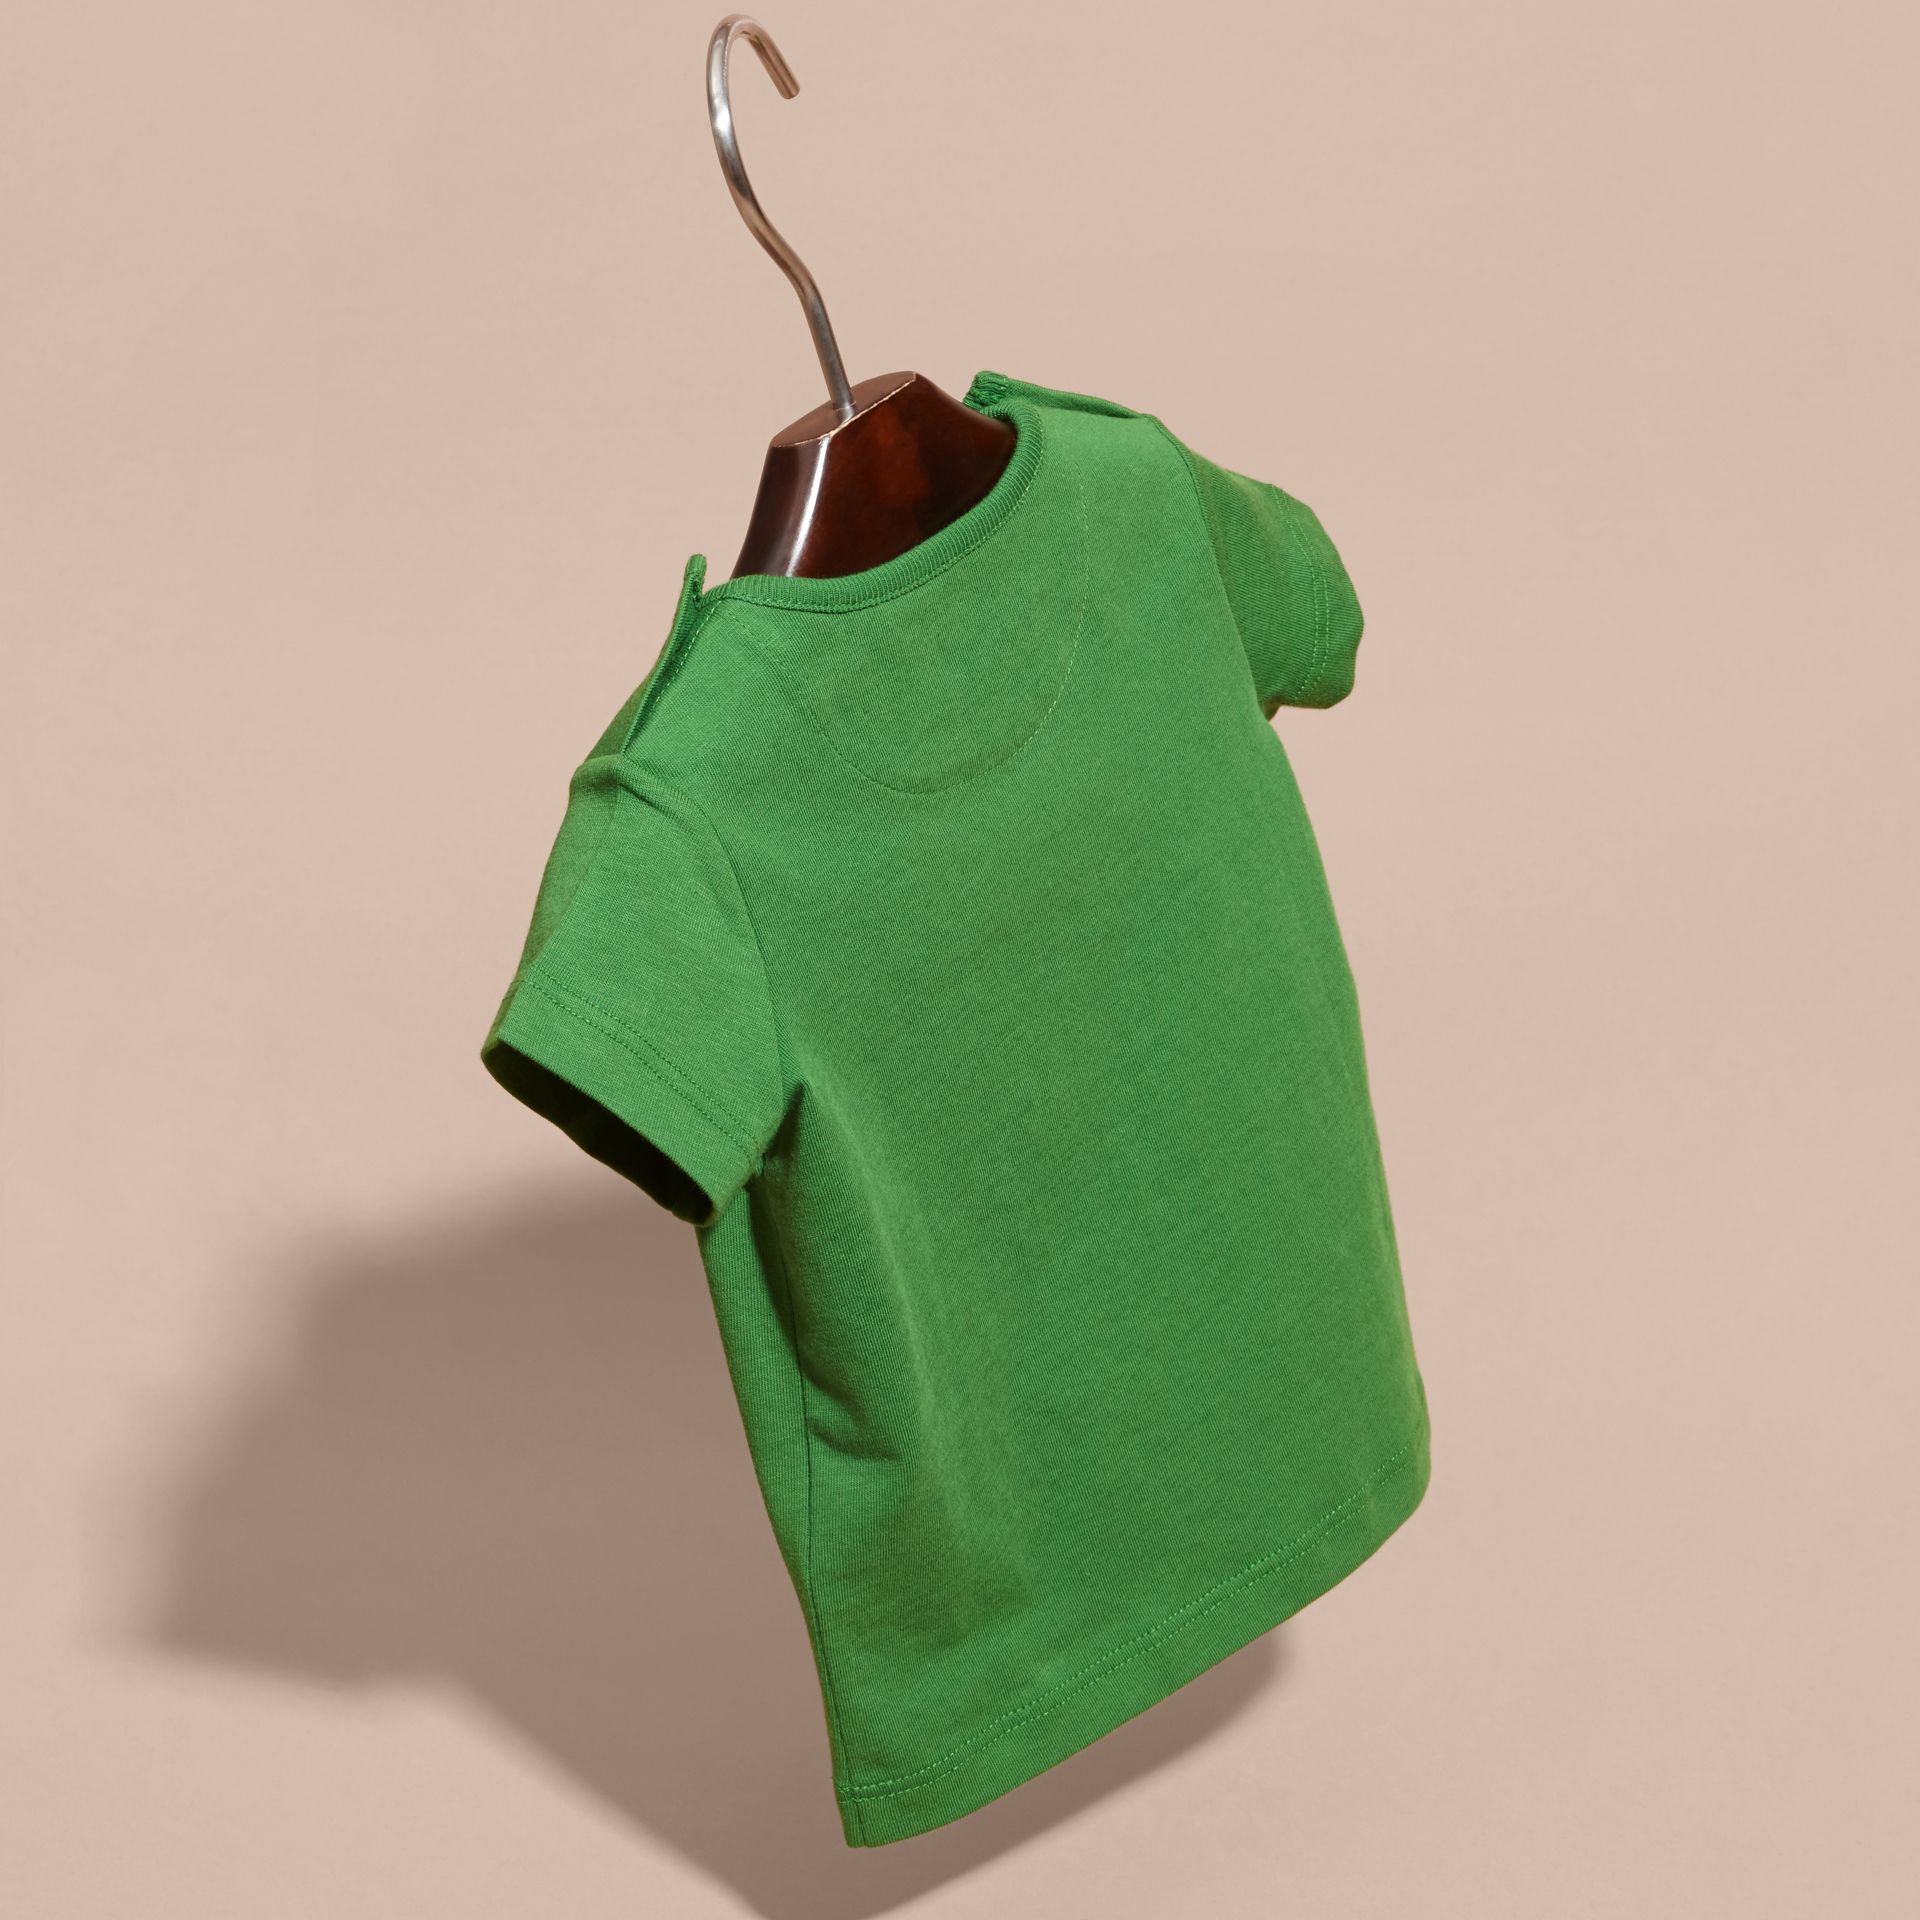 Verde felce brillante T-shirt girocollo in cotone Verde Felce Brillante - immagine della galleria 4